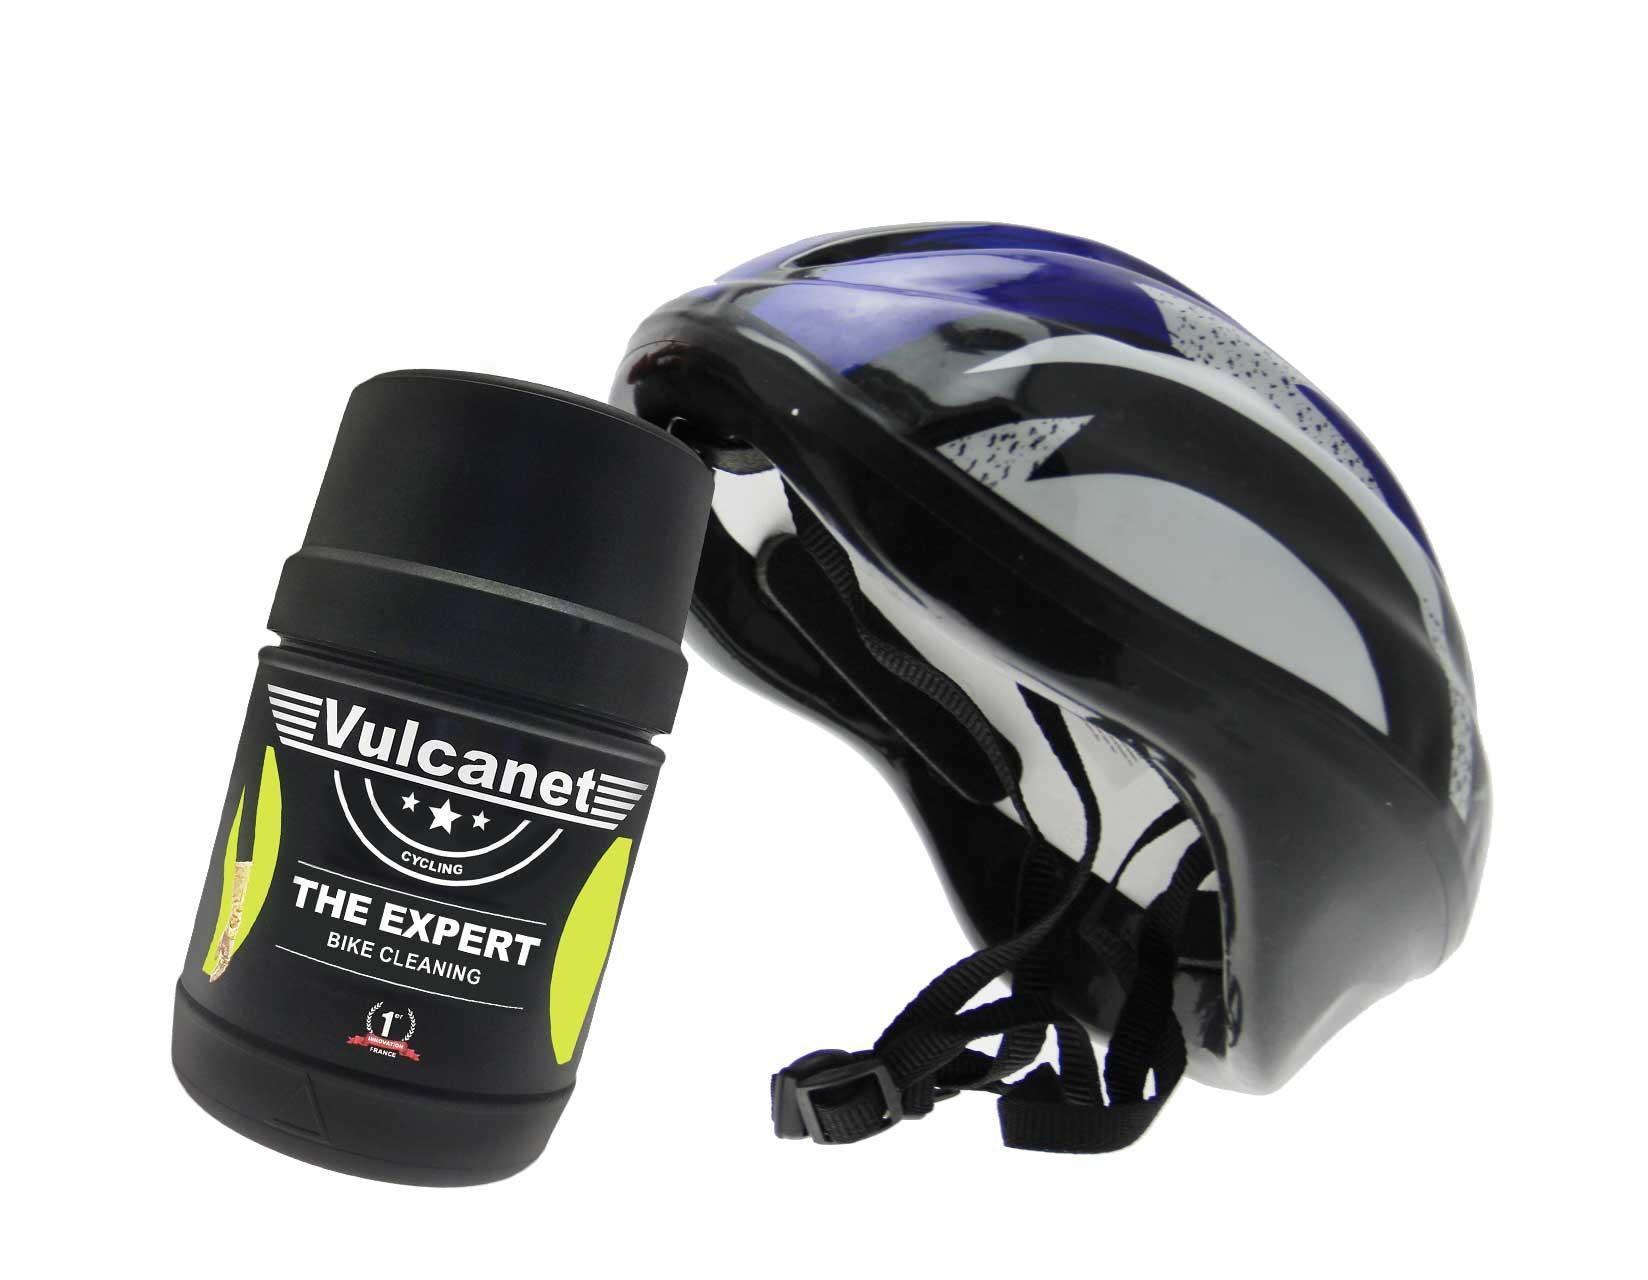 Vulcanet vélo et casque